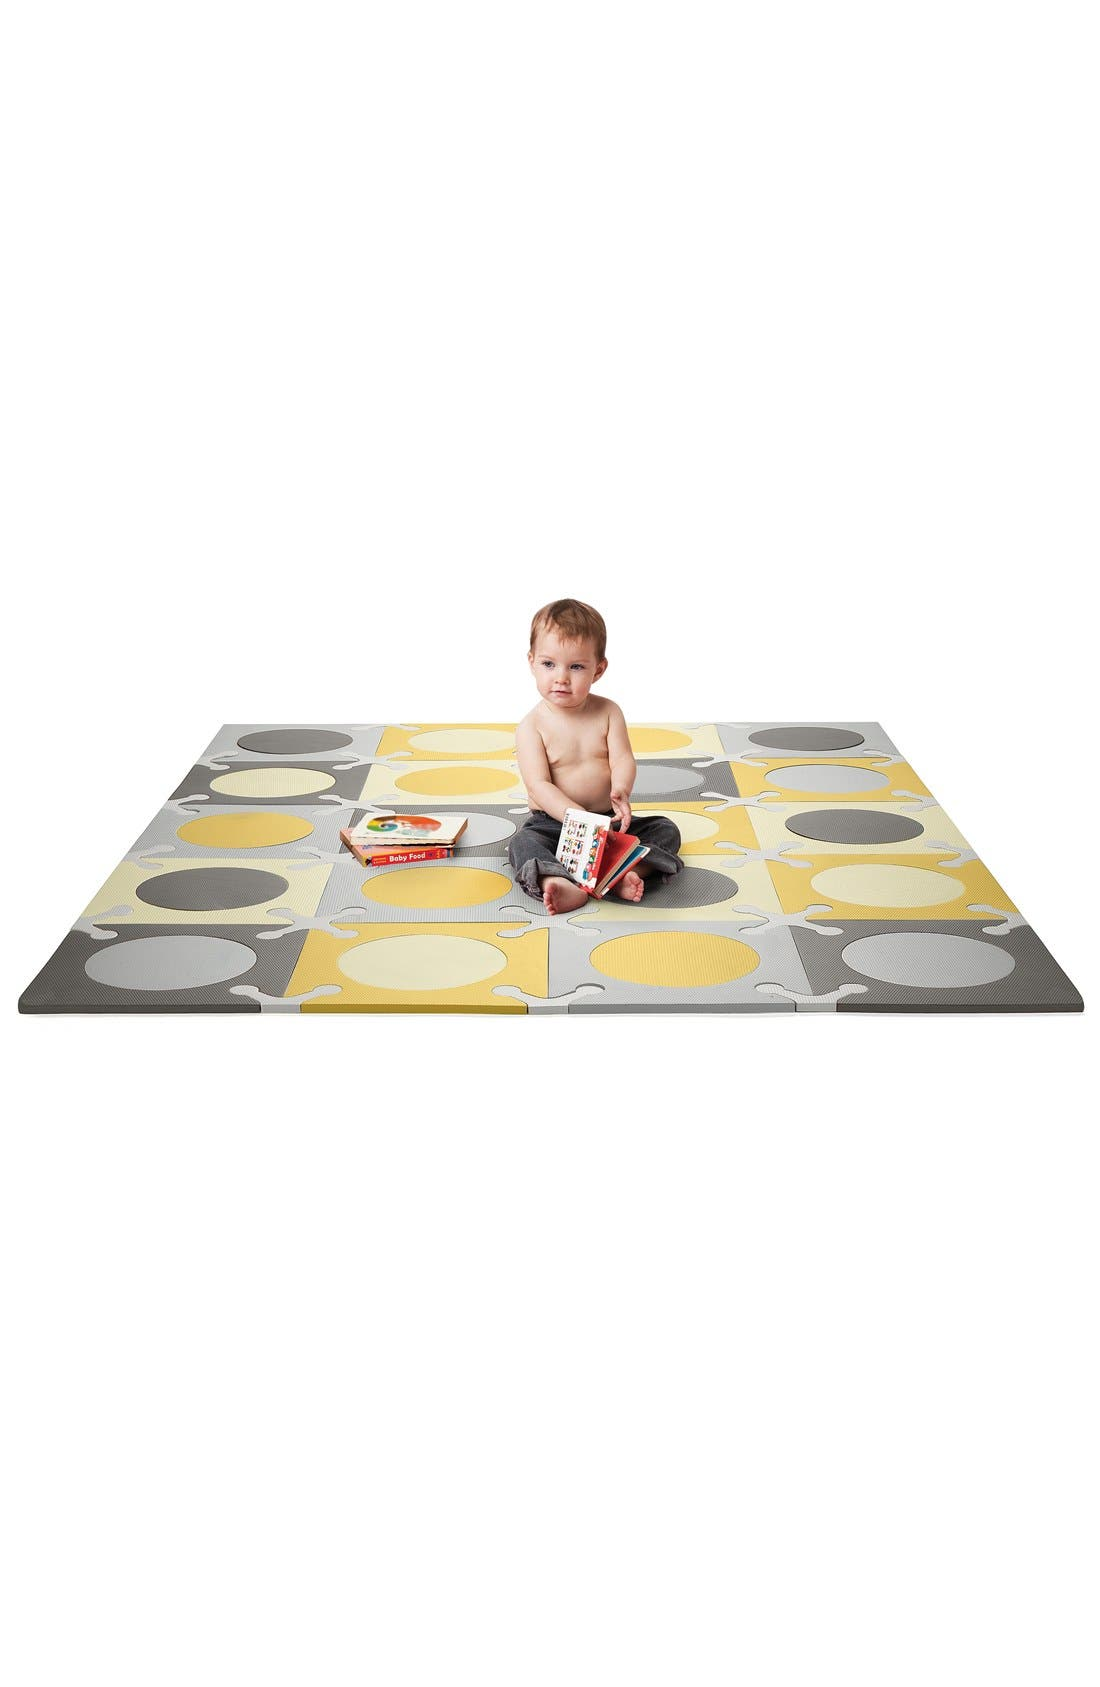 'Playspot' Floor Tiles,                             Alternate thumbnail 2, color,                             Gray/ Gold